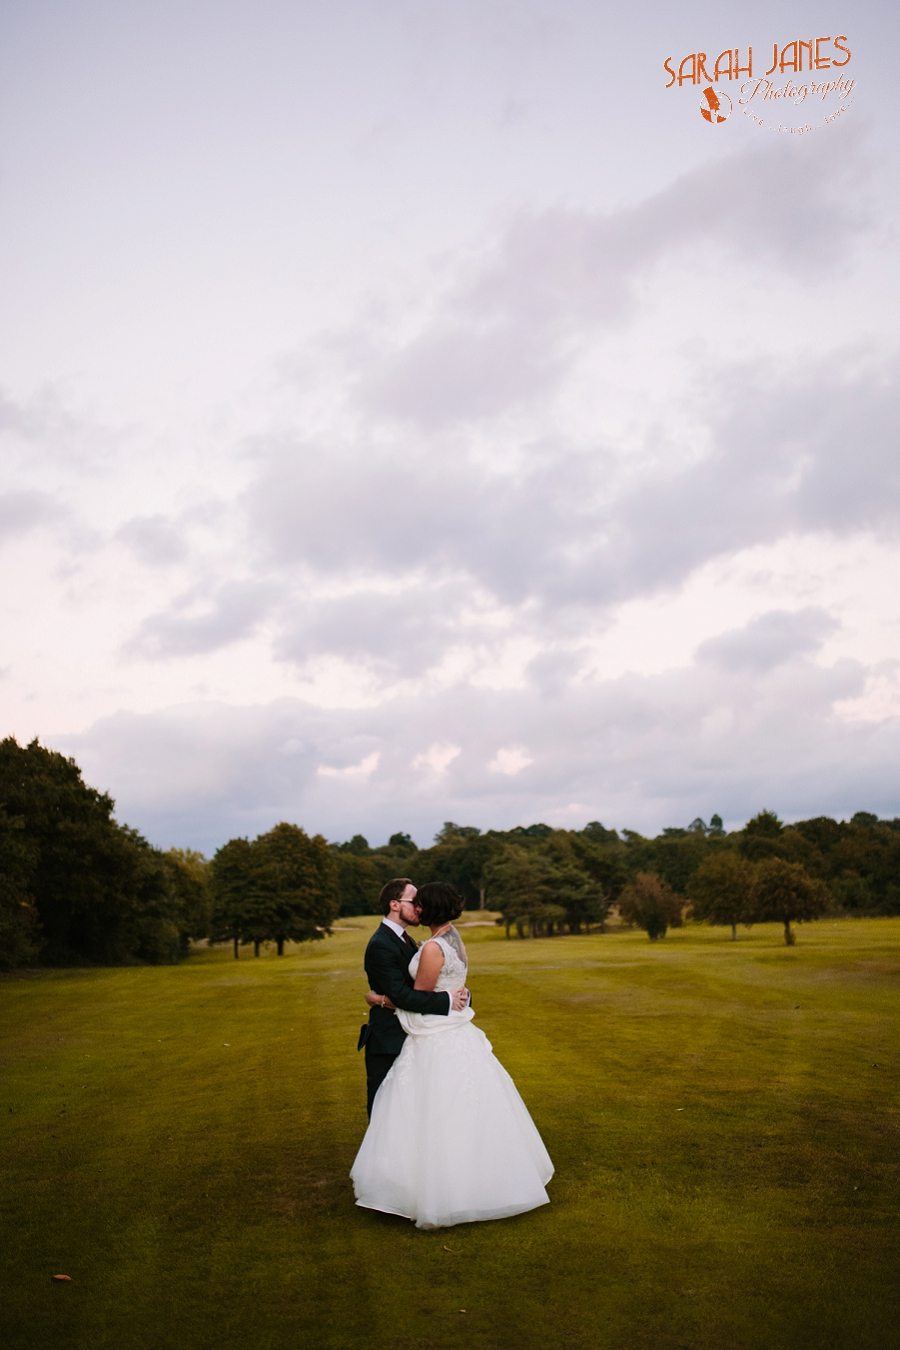 Sarah Janes Photography, Surrey wedding photography, wedding photography in Surrey, Wedding photography at Oaks Farm Weddings_0061.jpg